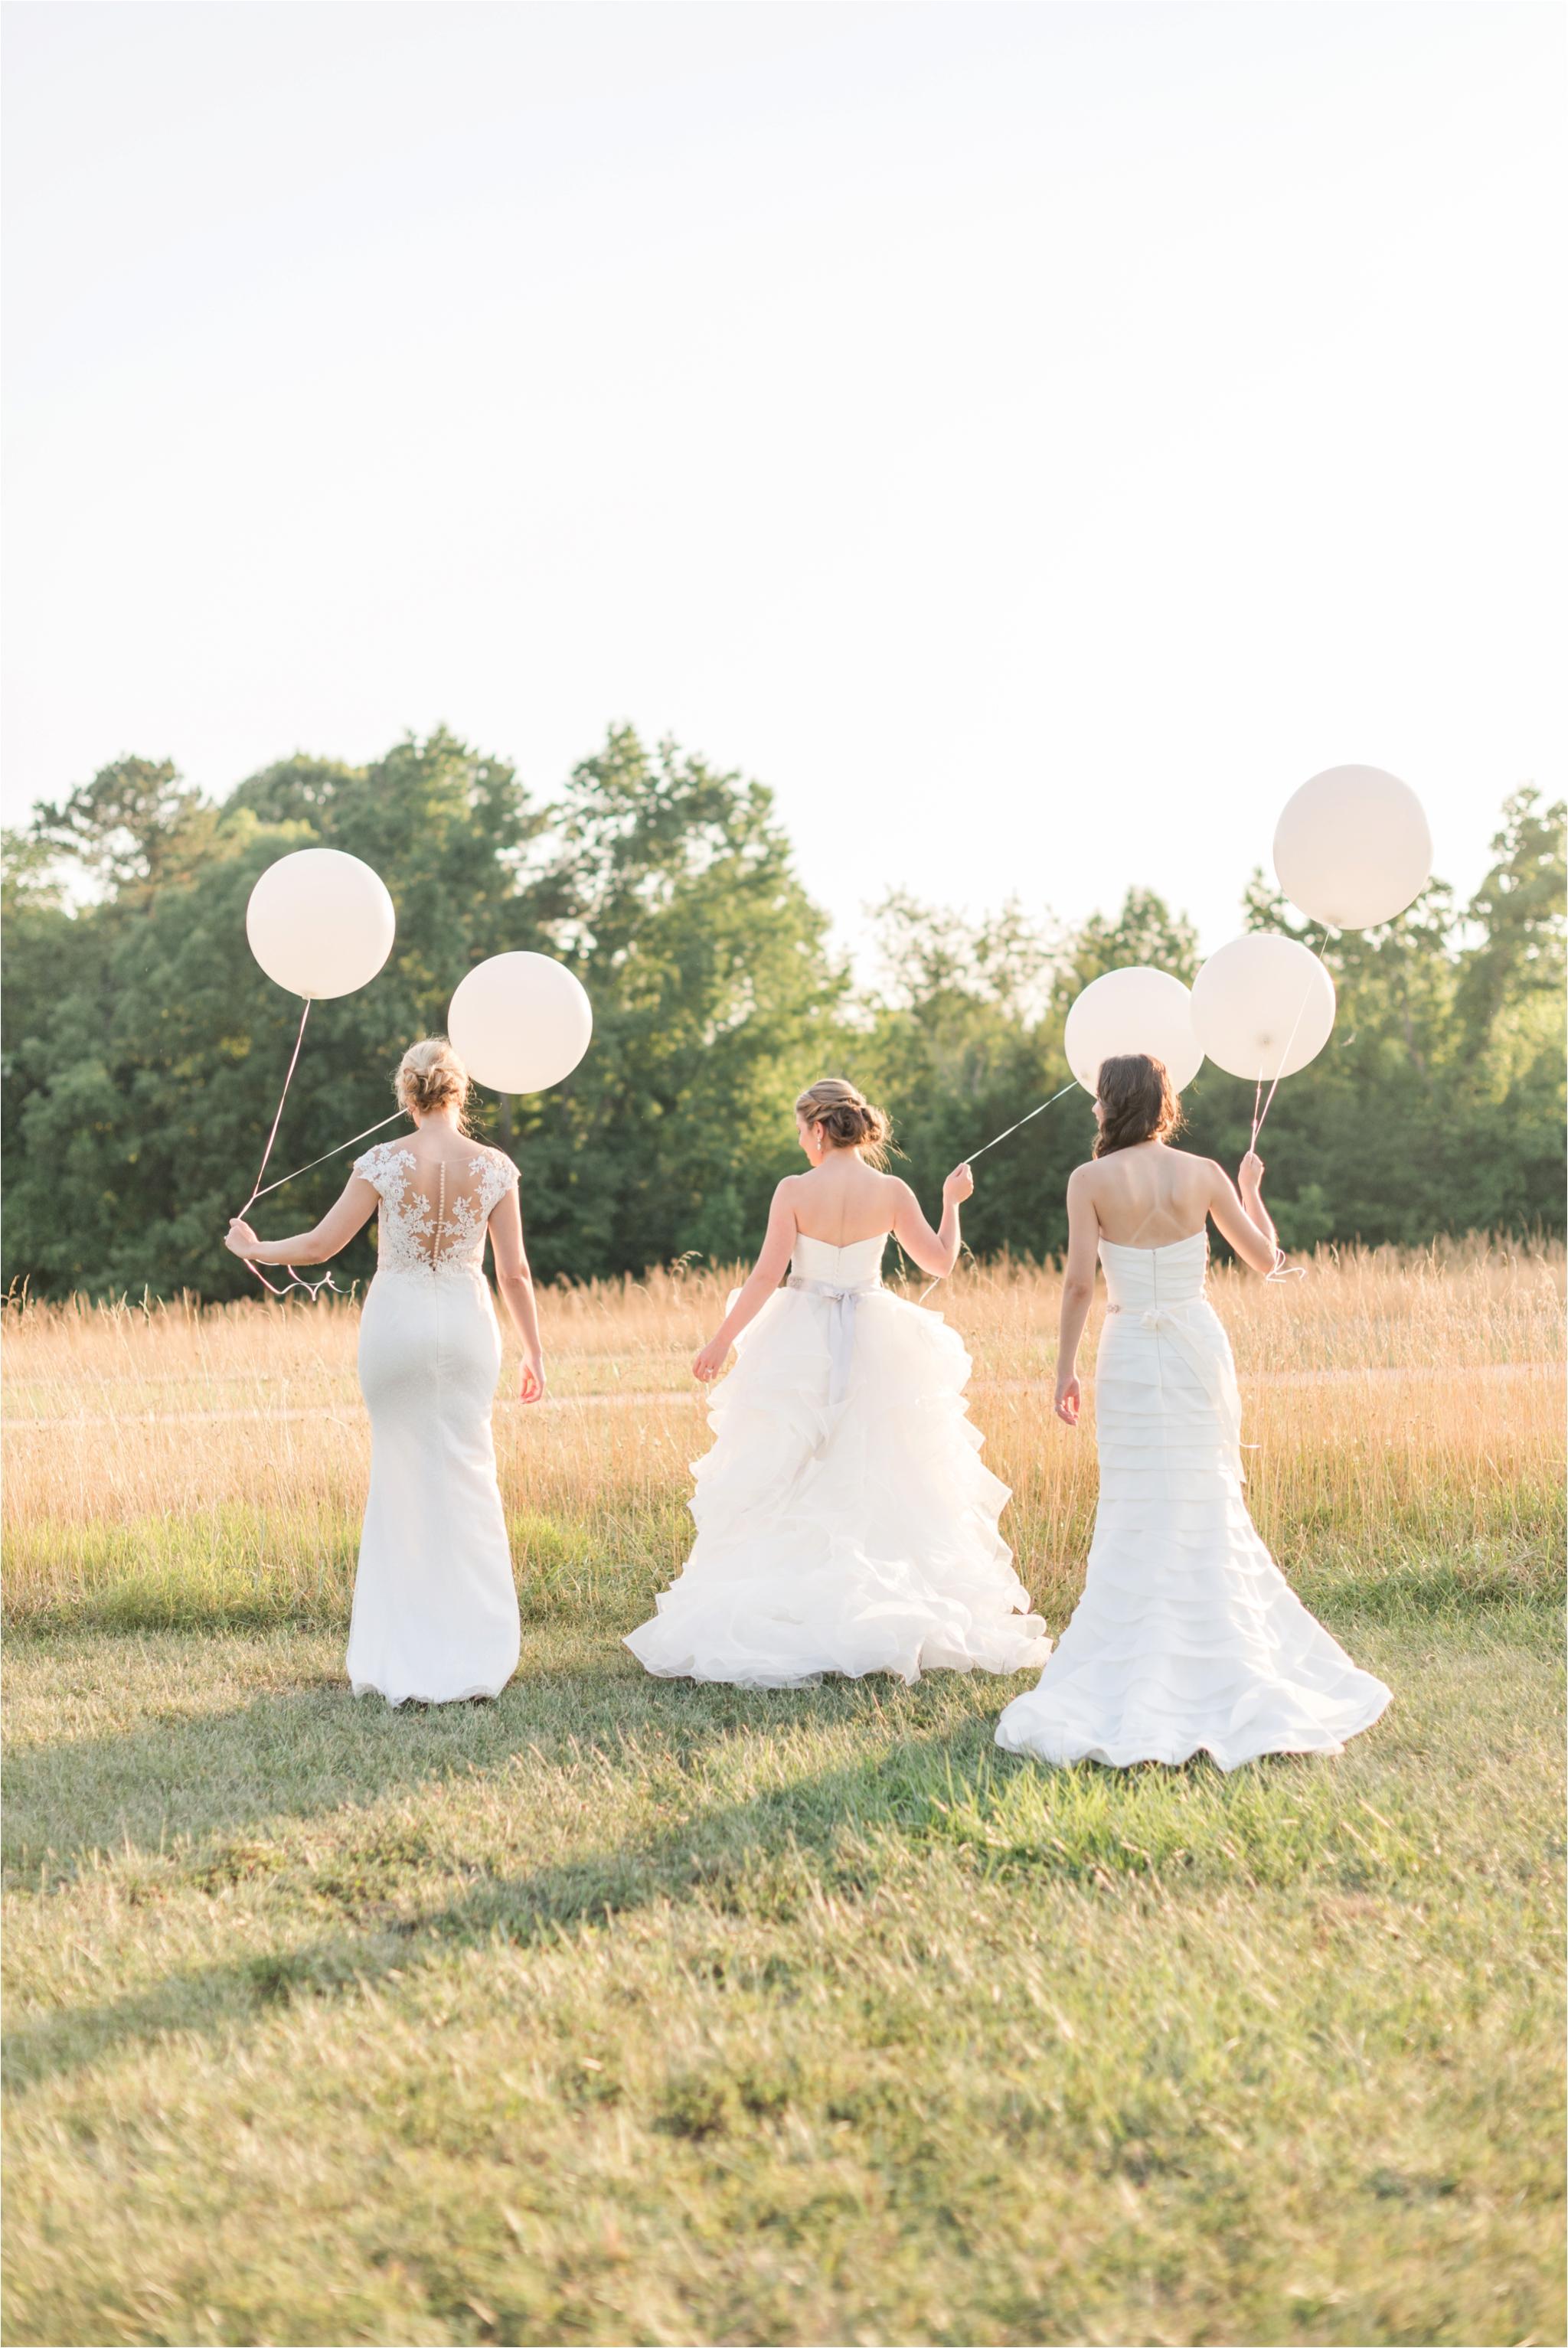 Styled Shoot The Meadows Wedding Venue Raleigh North Carolina Wedding Photographer Jaclyn Auletta Photography